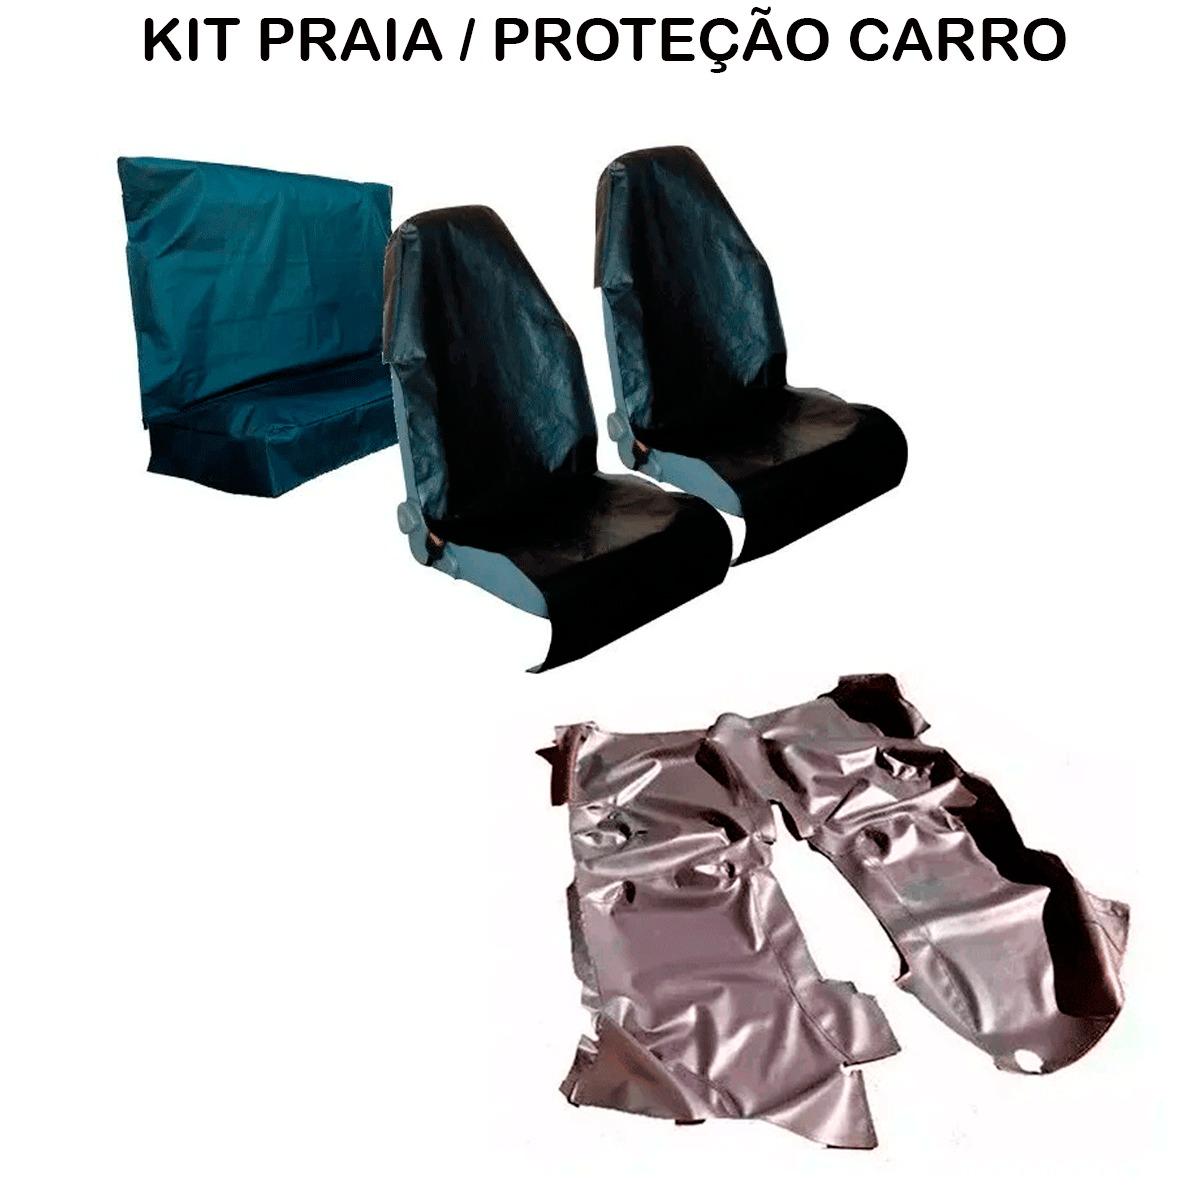 Tapete Em Vinil Volkswagen Fox Todos + Capa Banco Protecao Banco Areia Suor Academia